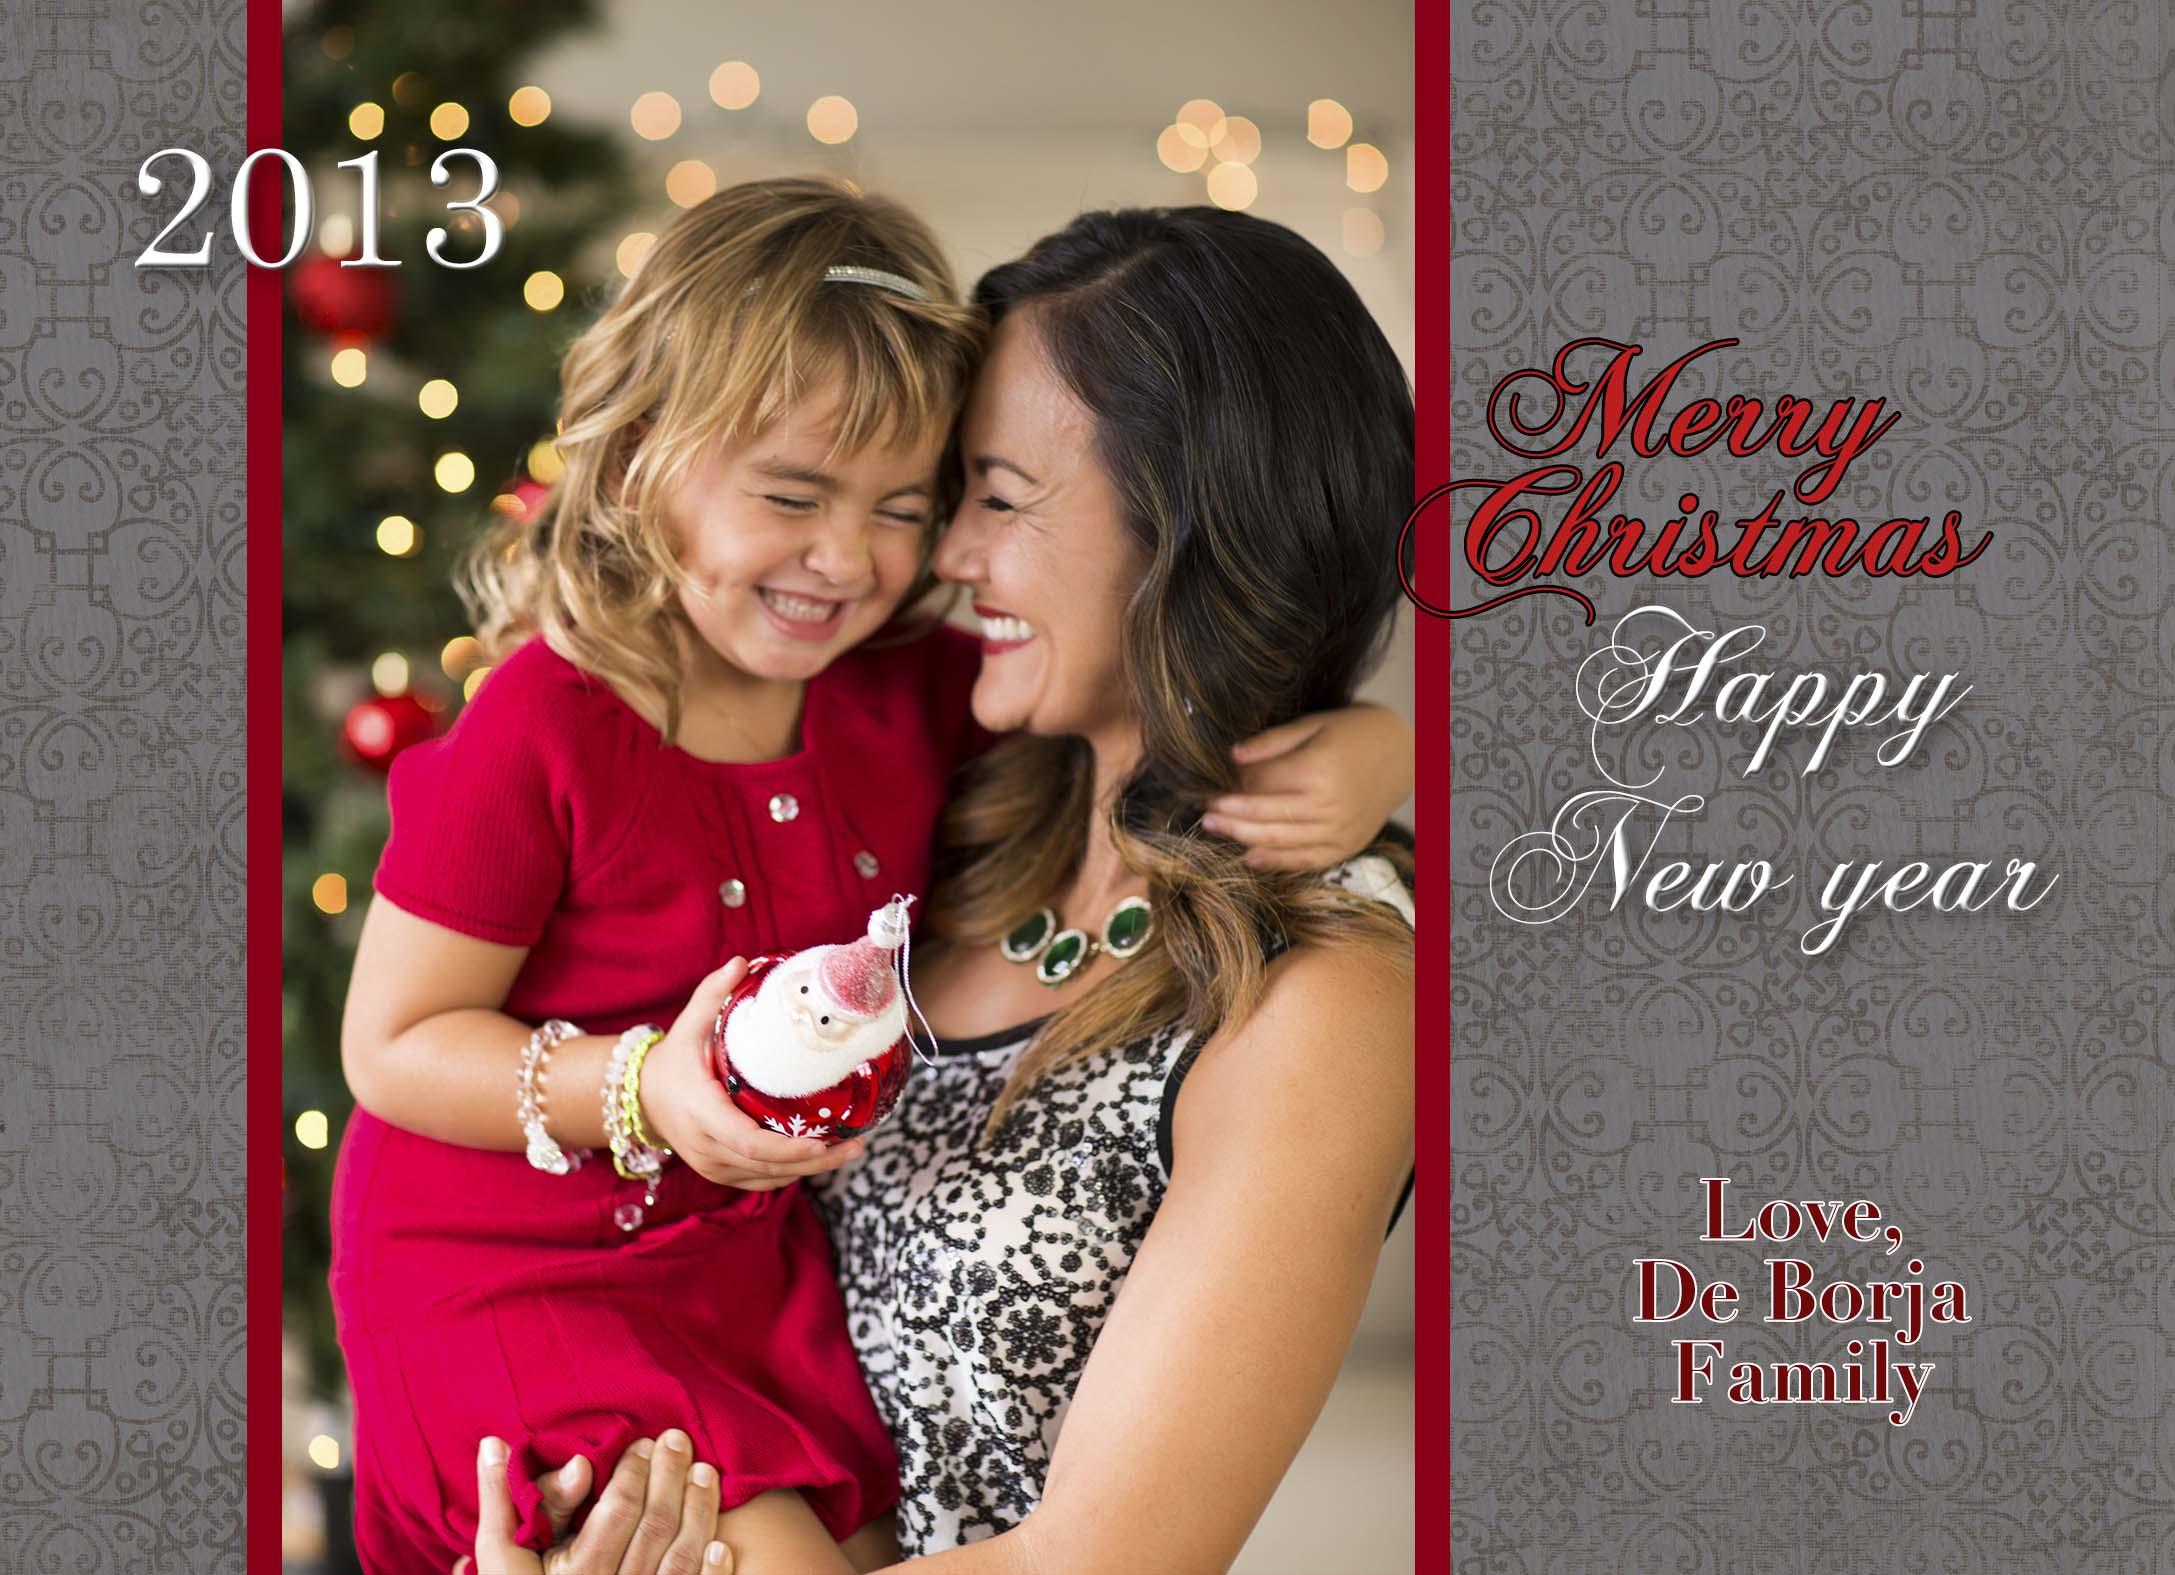 Christmas Card12 Front.jpg